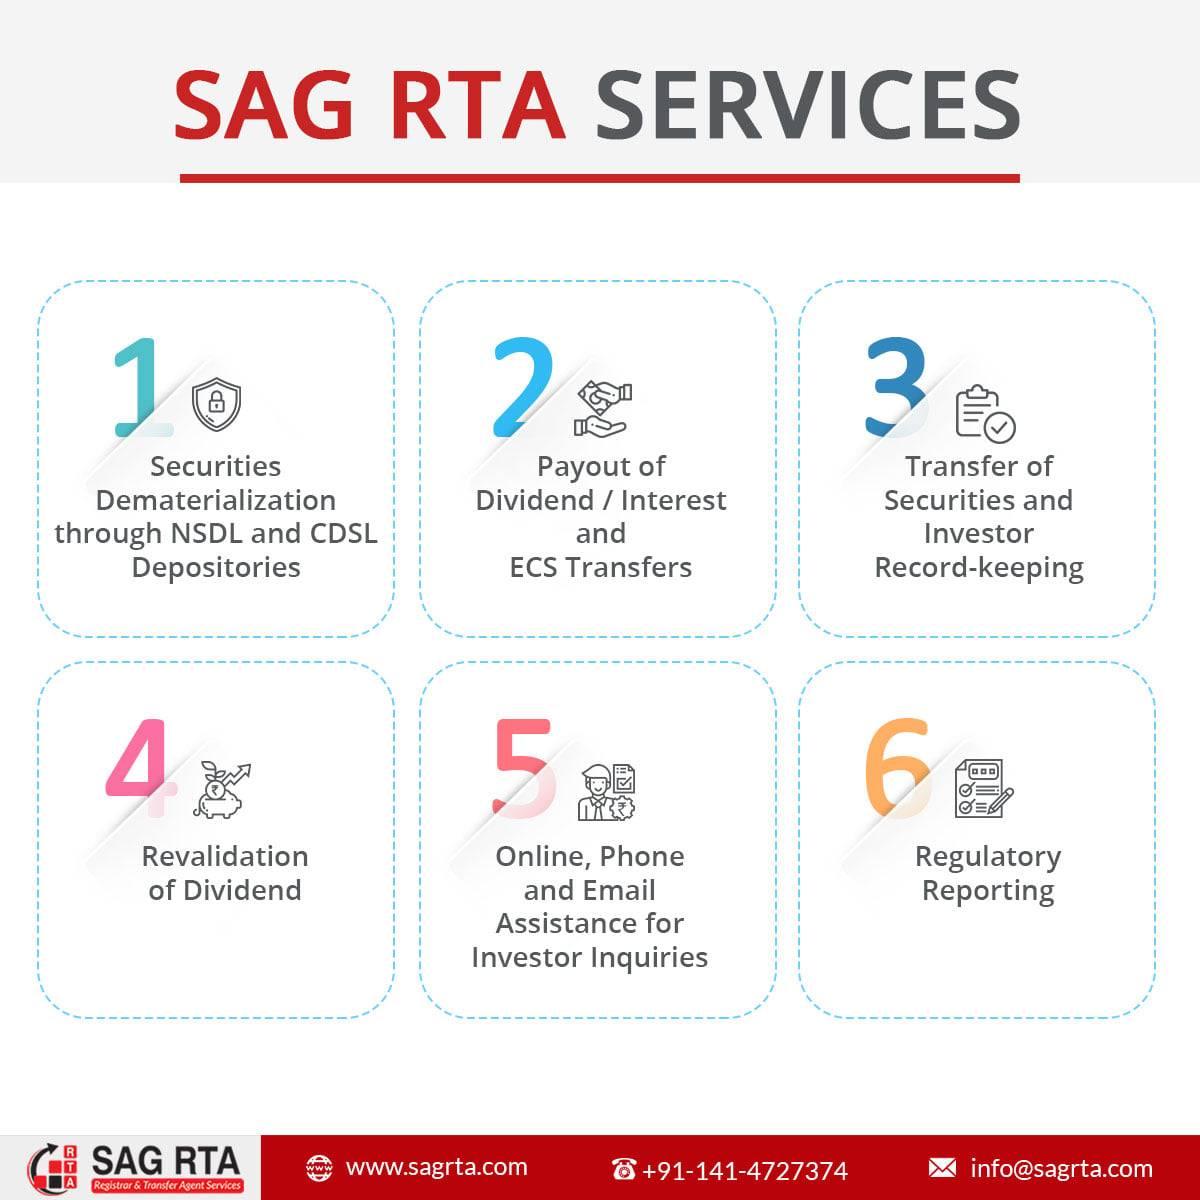 SAGRTA, companies, RTA